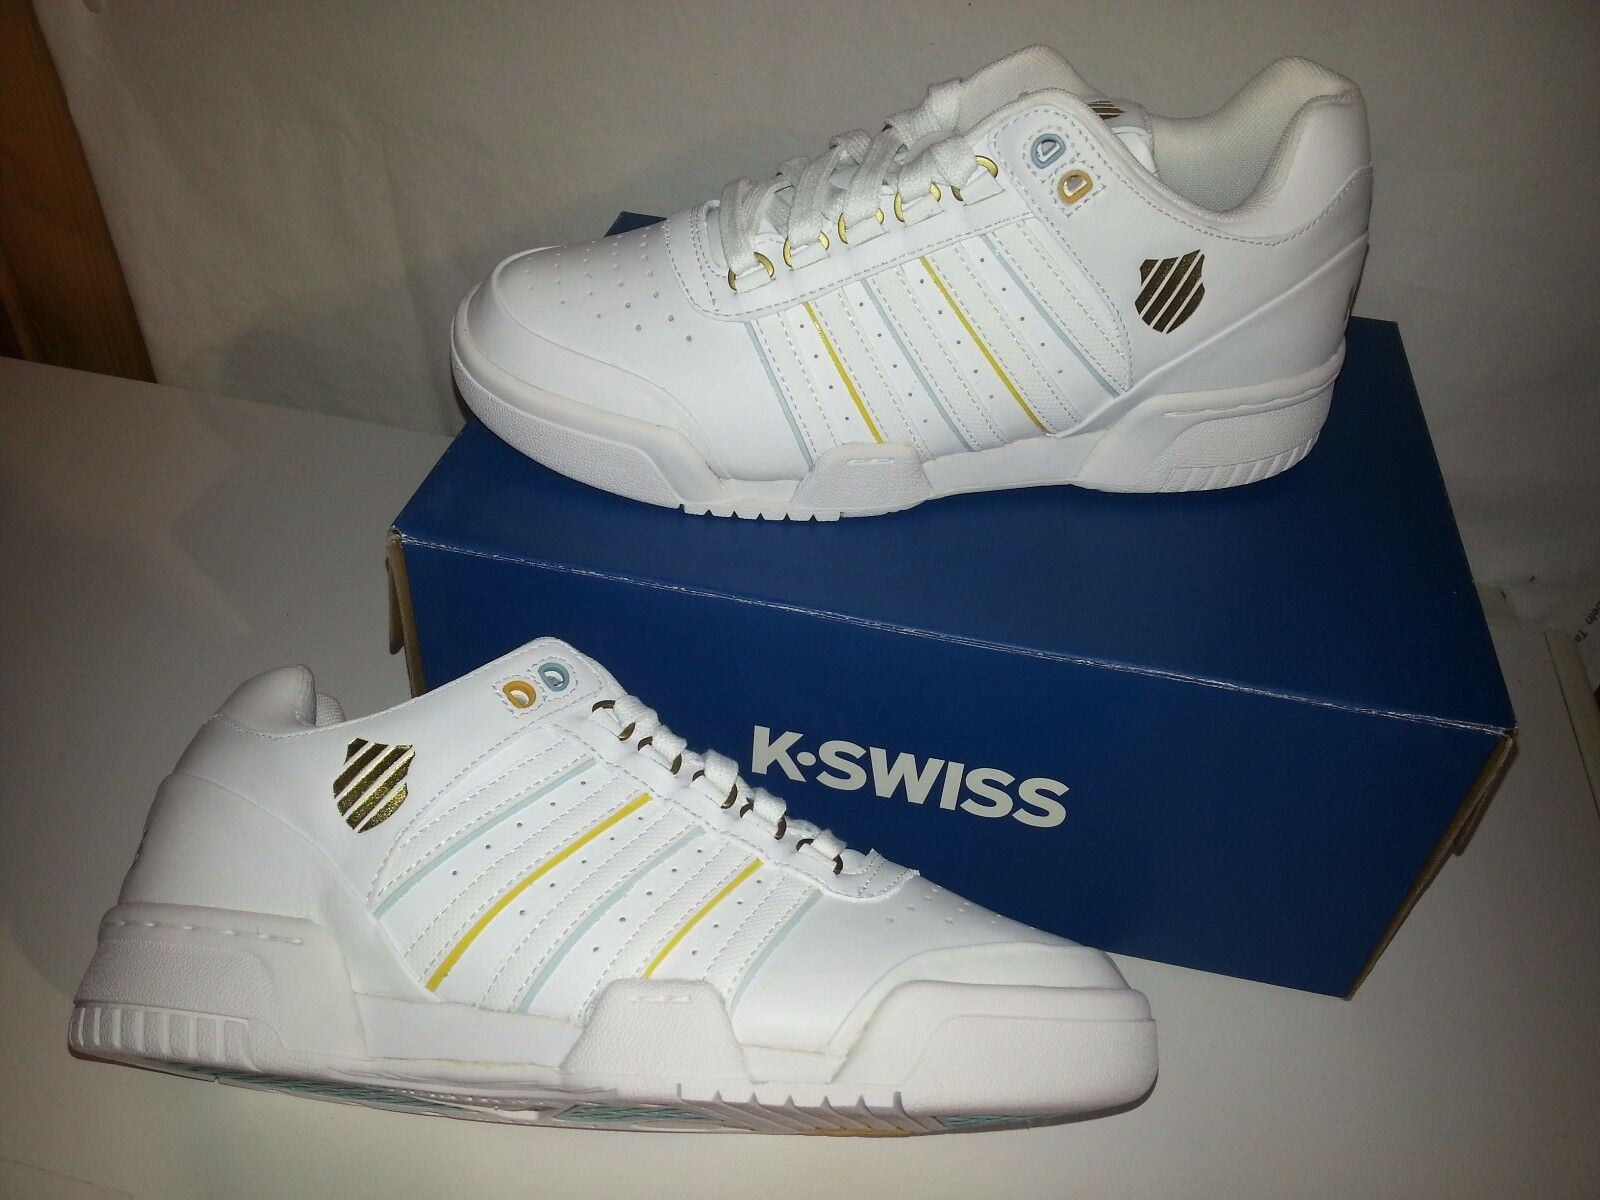 K-Swiss Gstaad Damen Leder Sneaker Sportschuhe weiß-kombiniert Größe 41 NEU